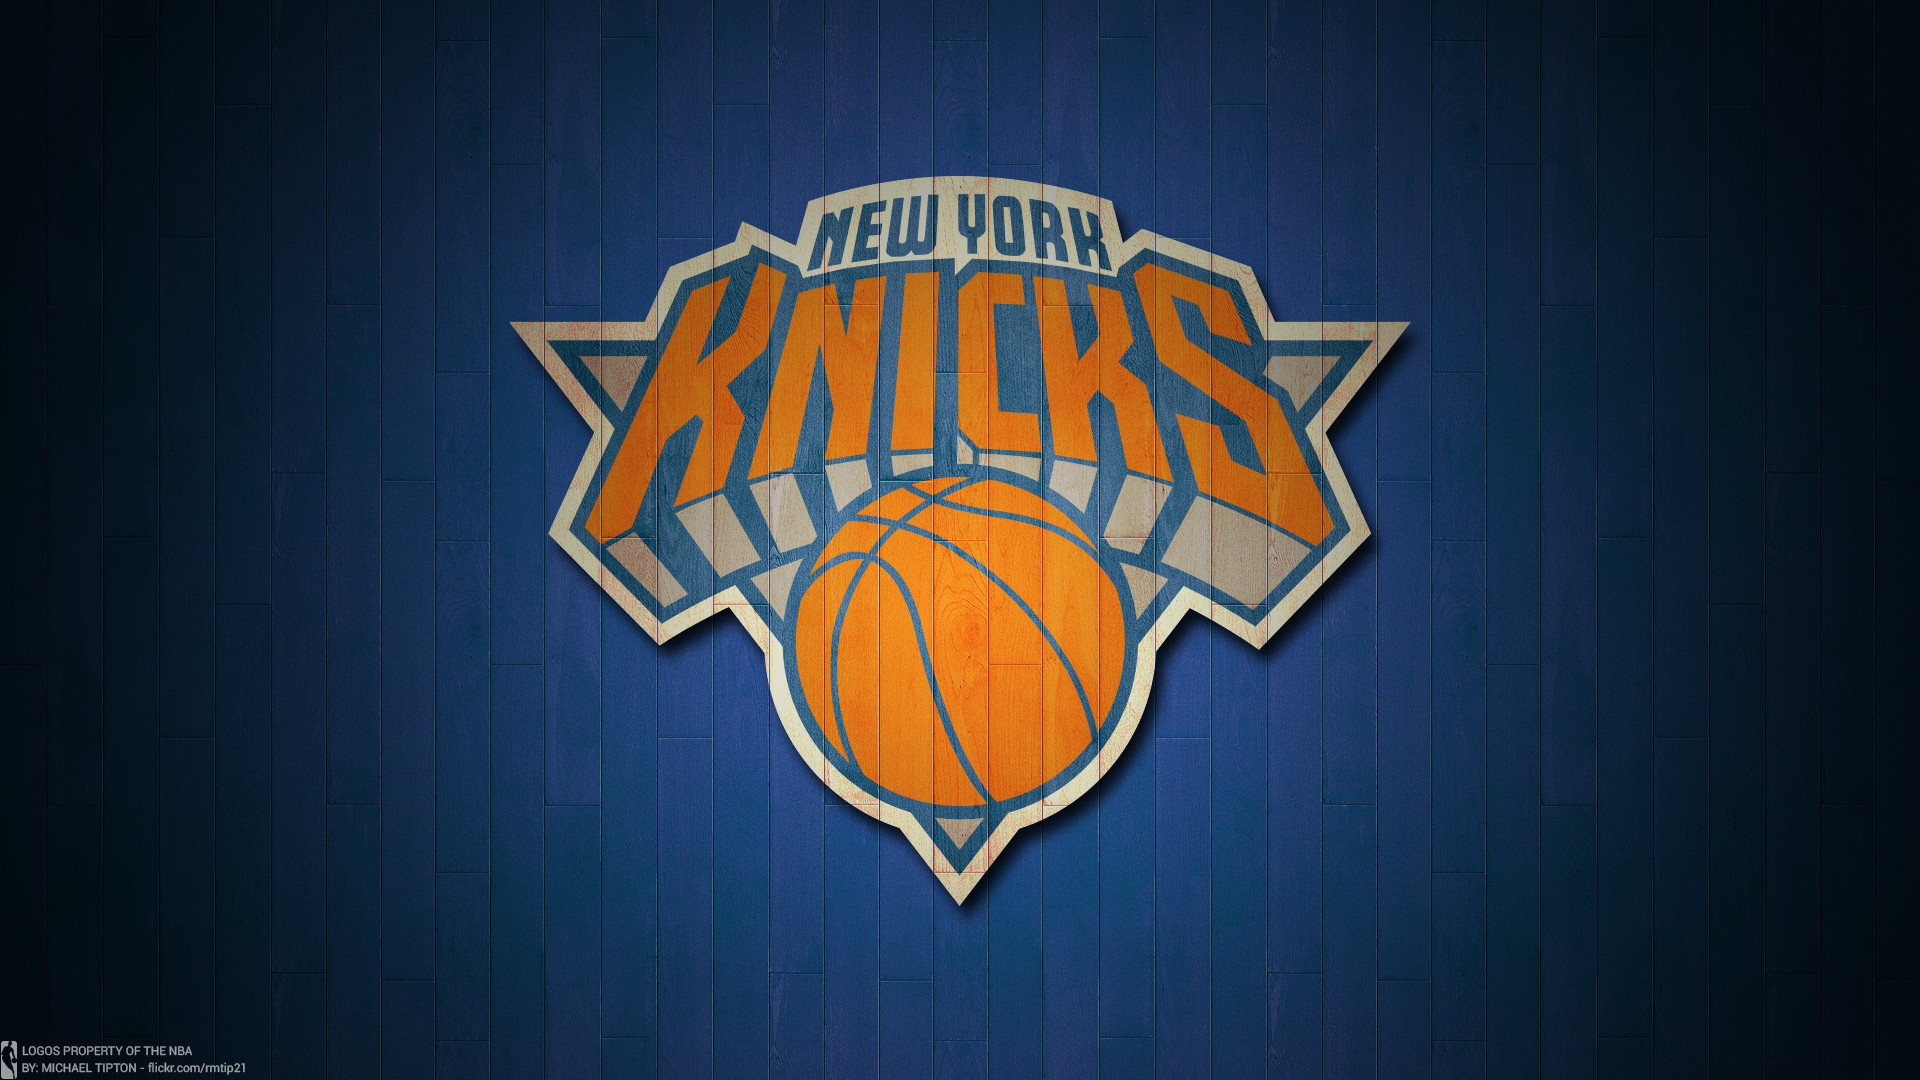 Knicks Iphone Wallpaper Lakers Logo Wallpaper 71 Images